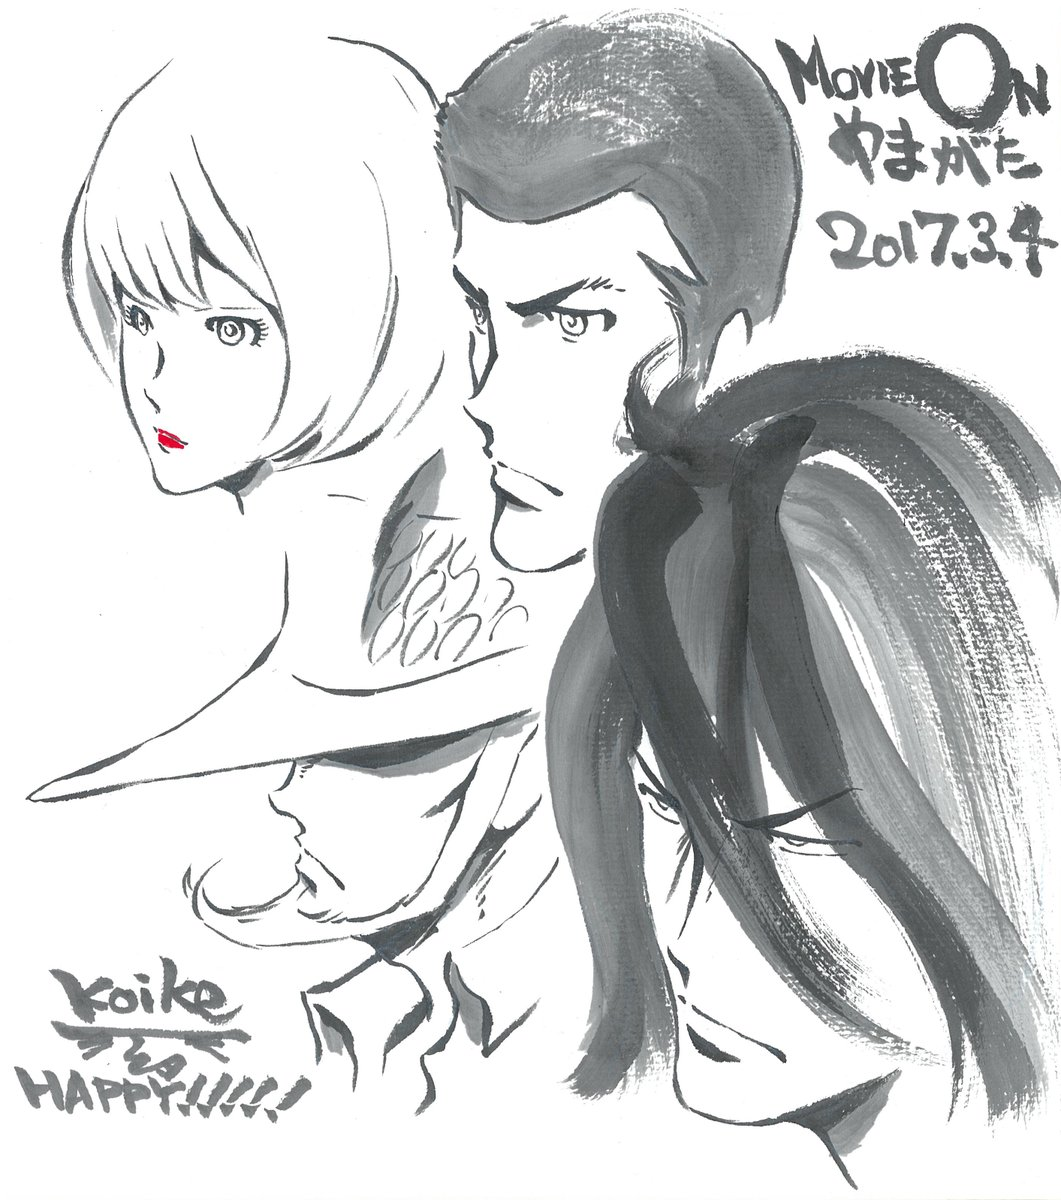 illustration lupin_iii lupin_iii:_chikemuri_no_ishikawa_goemon takeshi_koike web